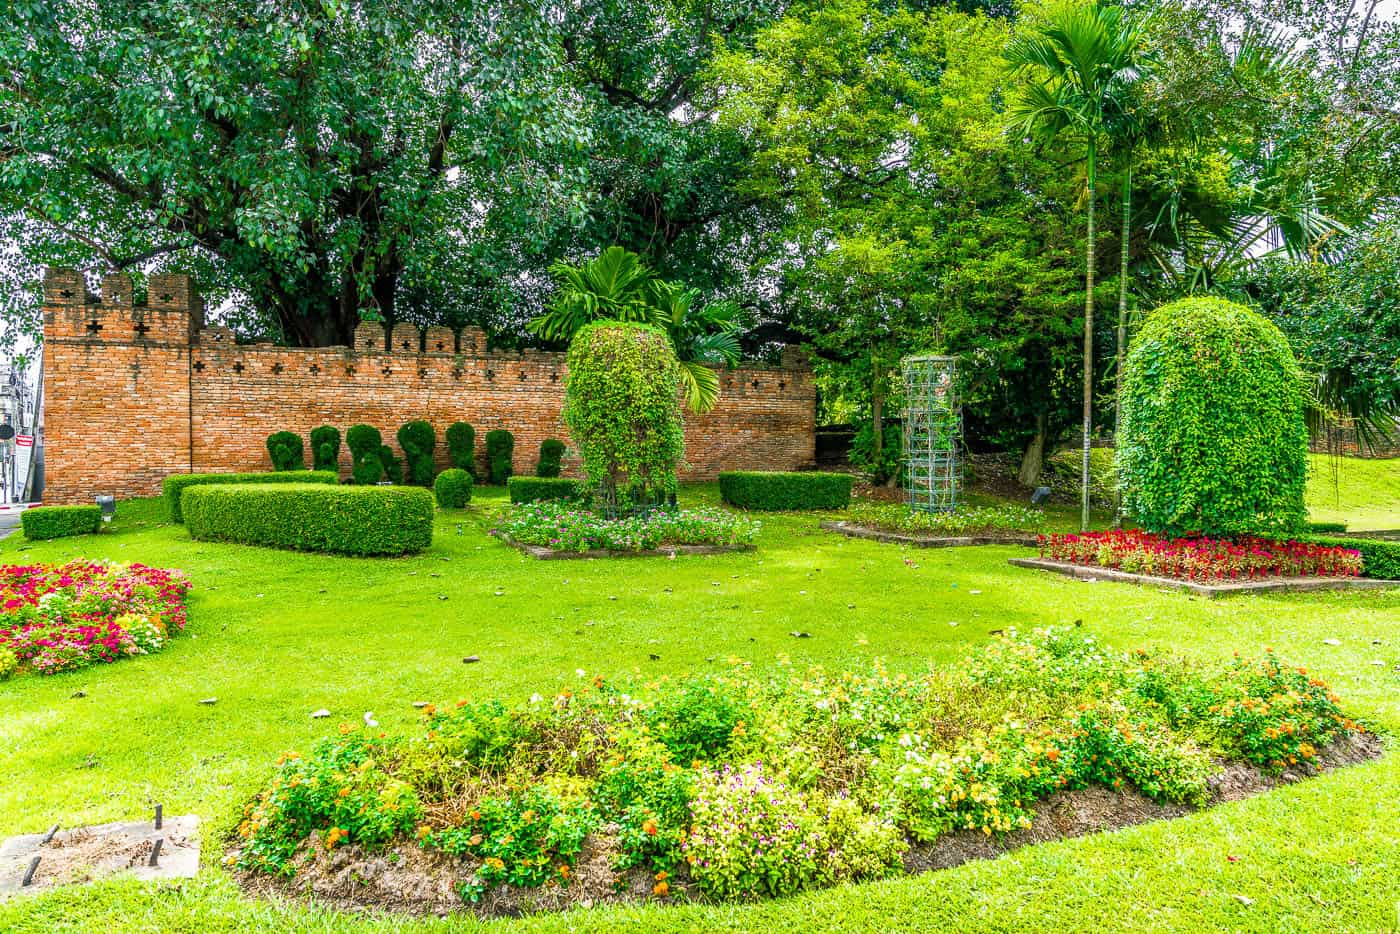 greenery chiang mai wall